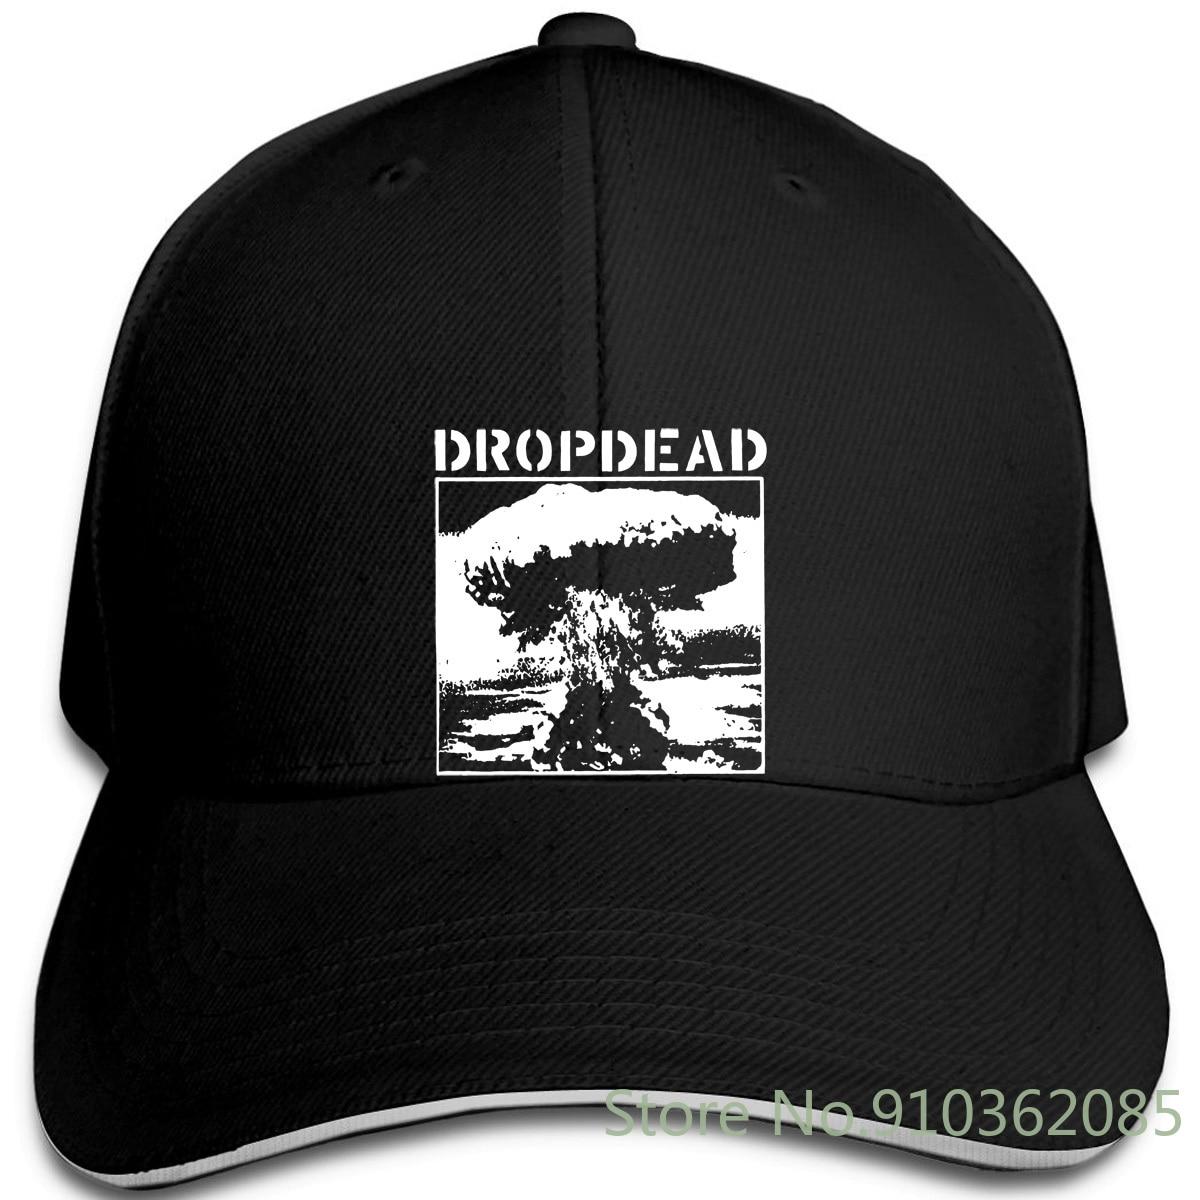 Dropdead V12 negro Hardcore Punk Grindcore todas las gorras ajustables gorra de béisbol hombres mujeres